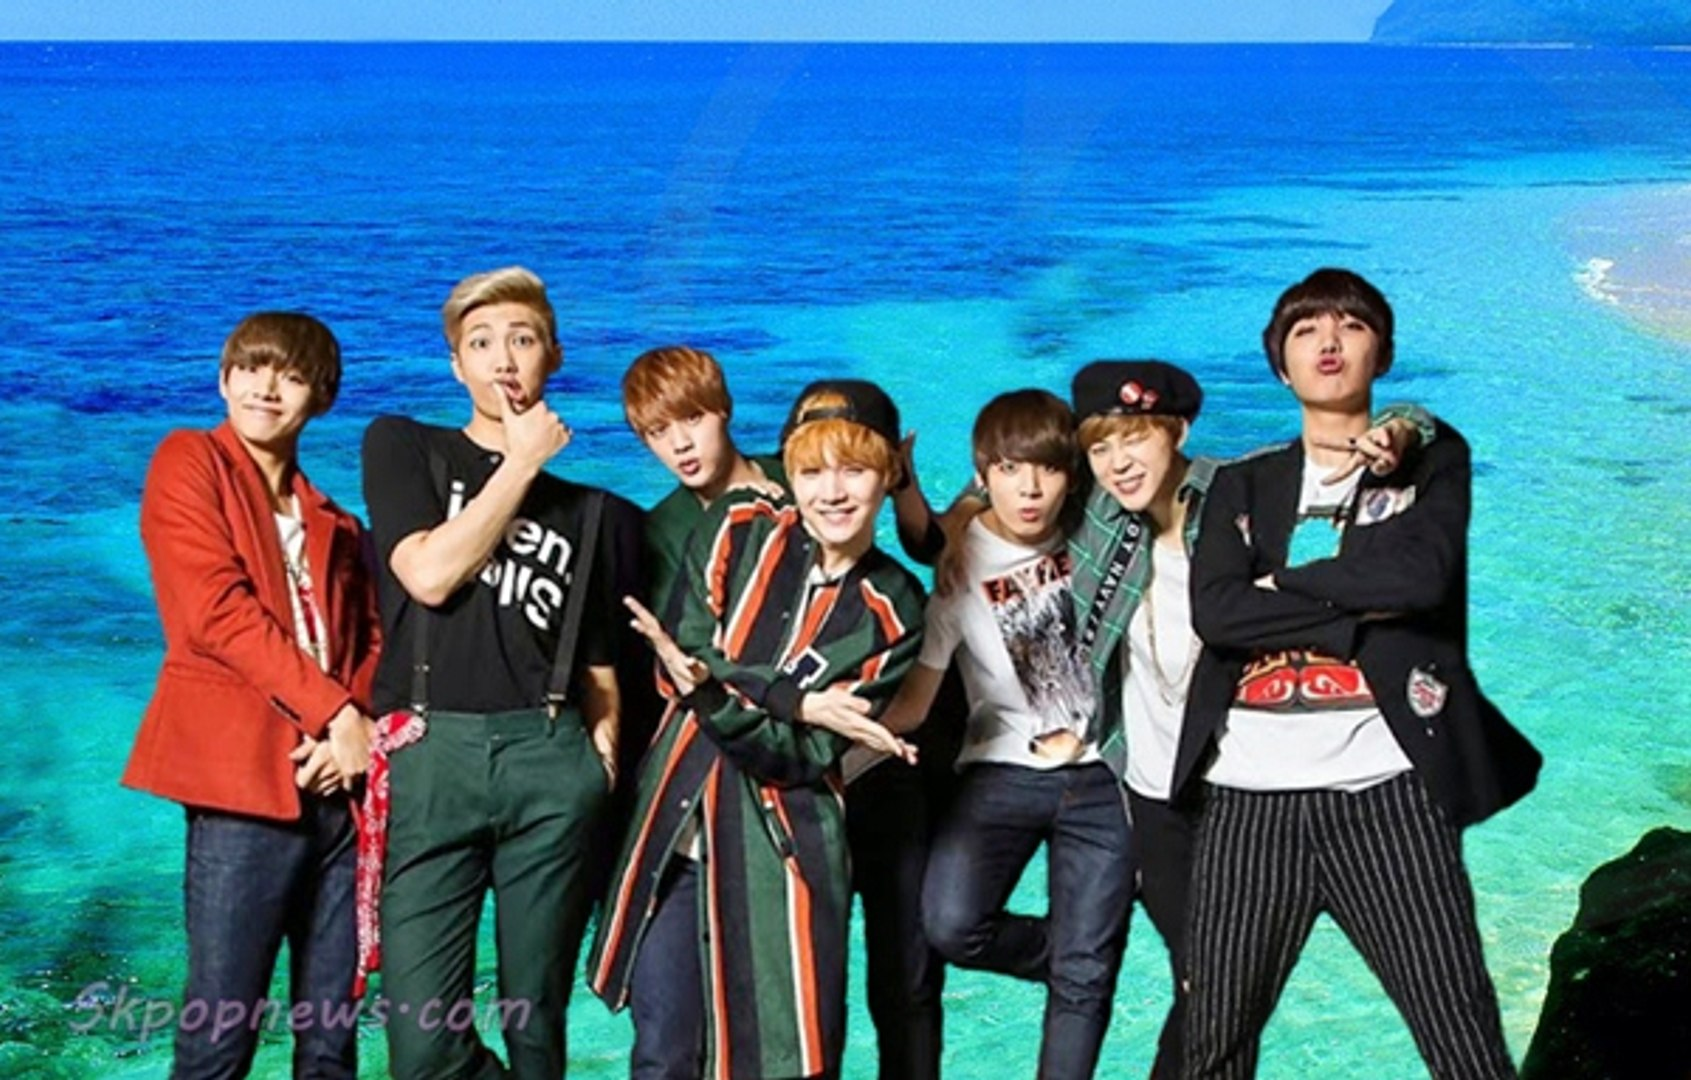 BTS Bon Voyage Season 2 Ep 2 Full Eng Sub